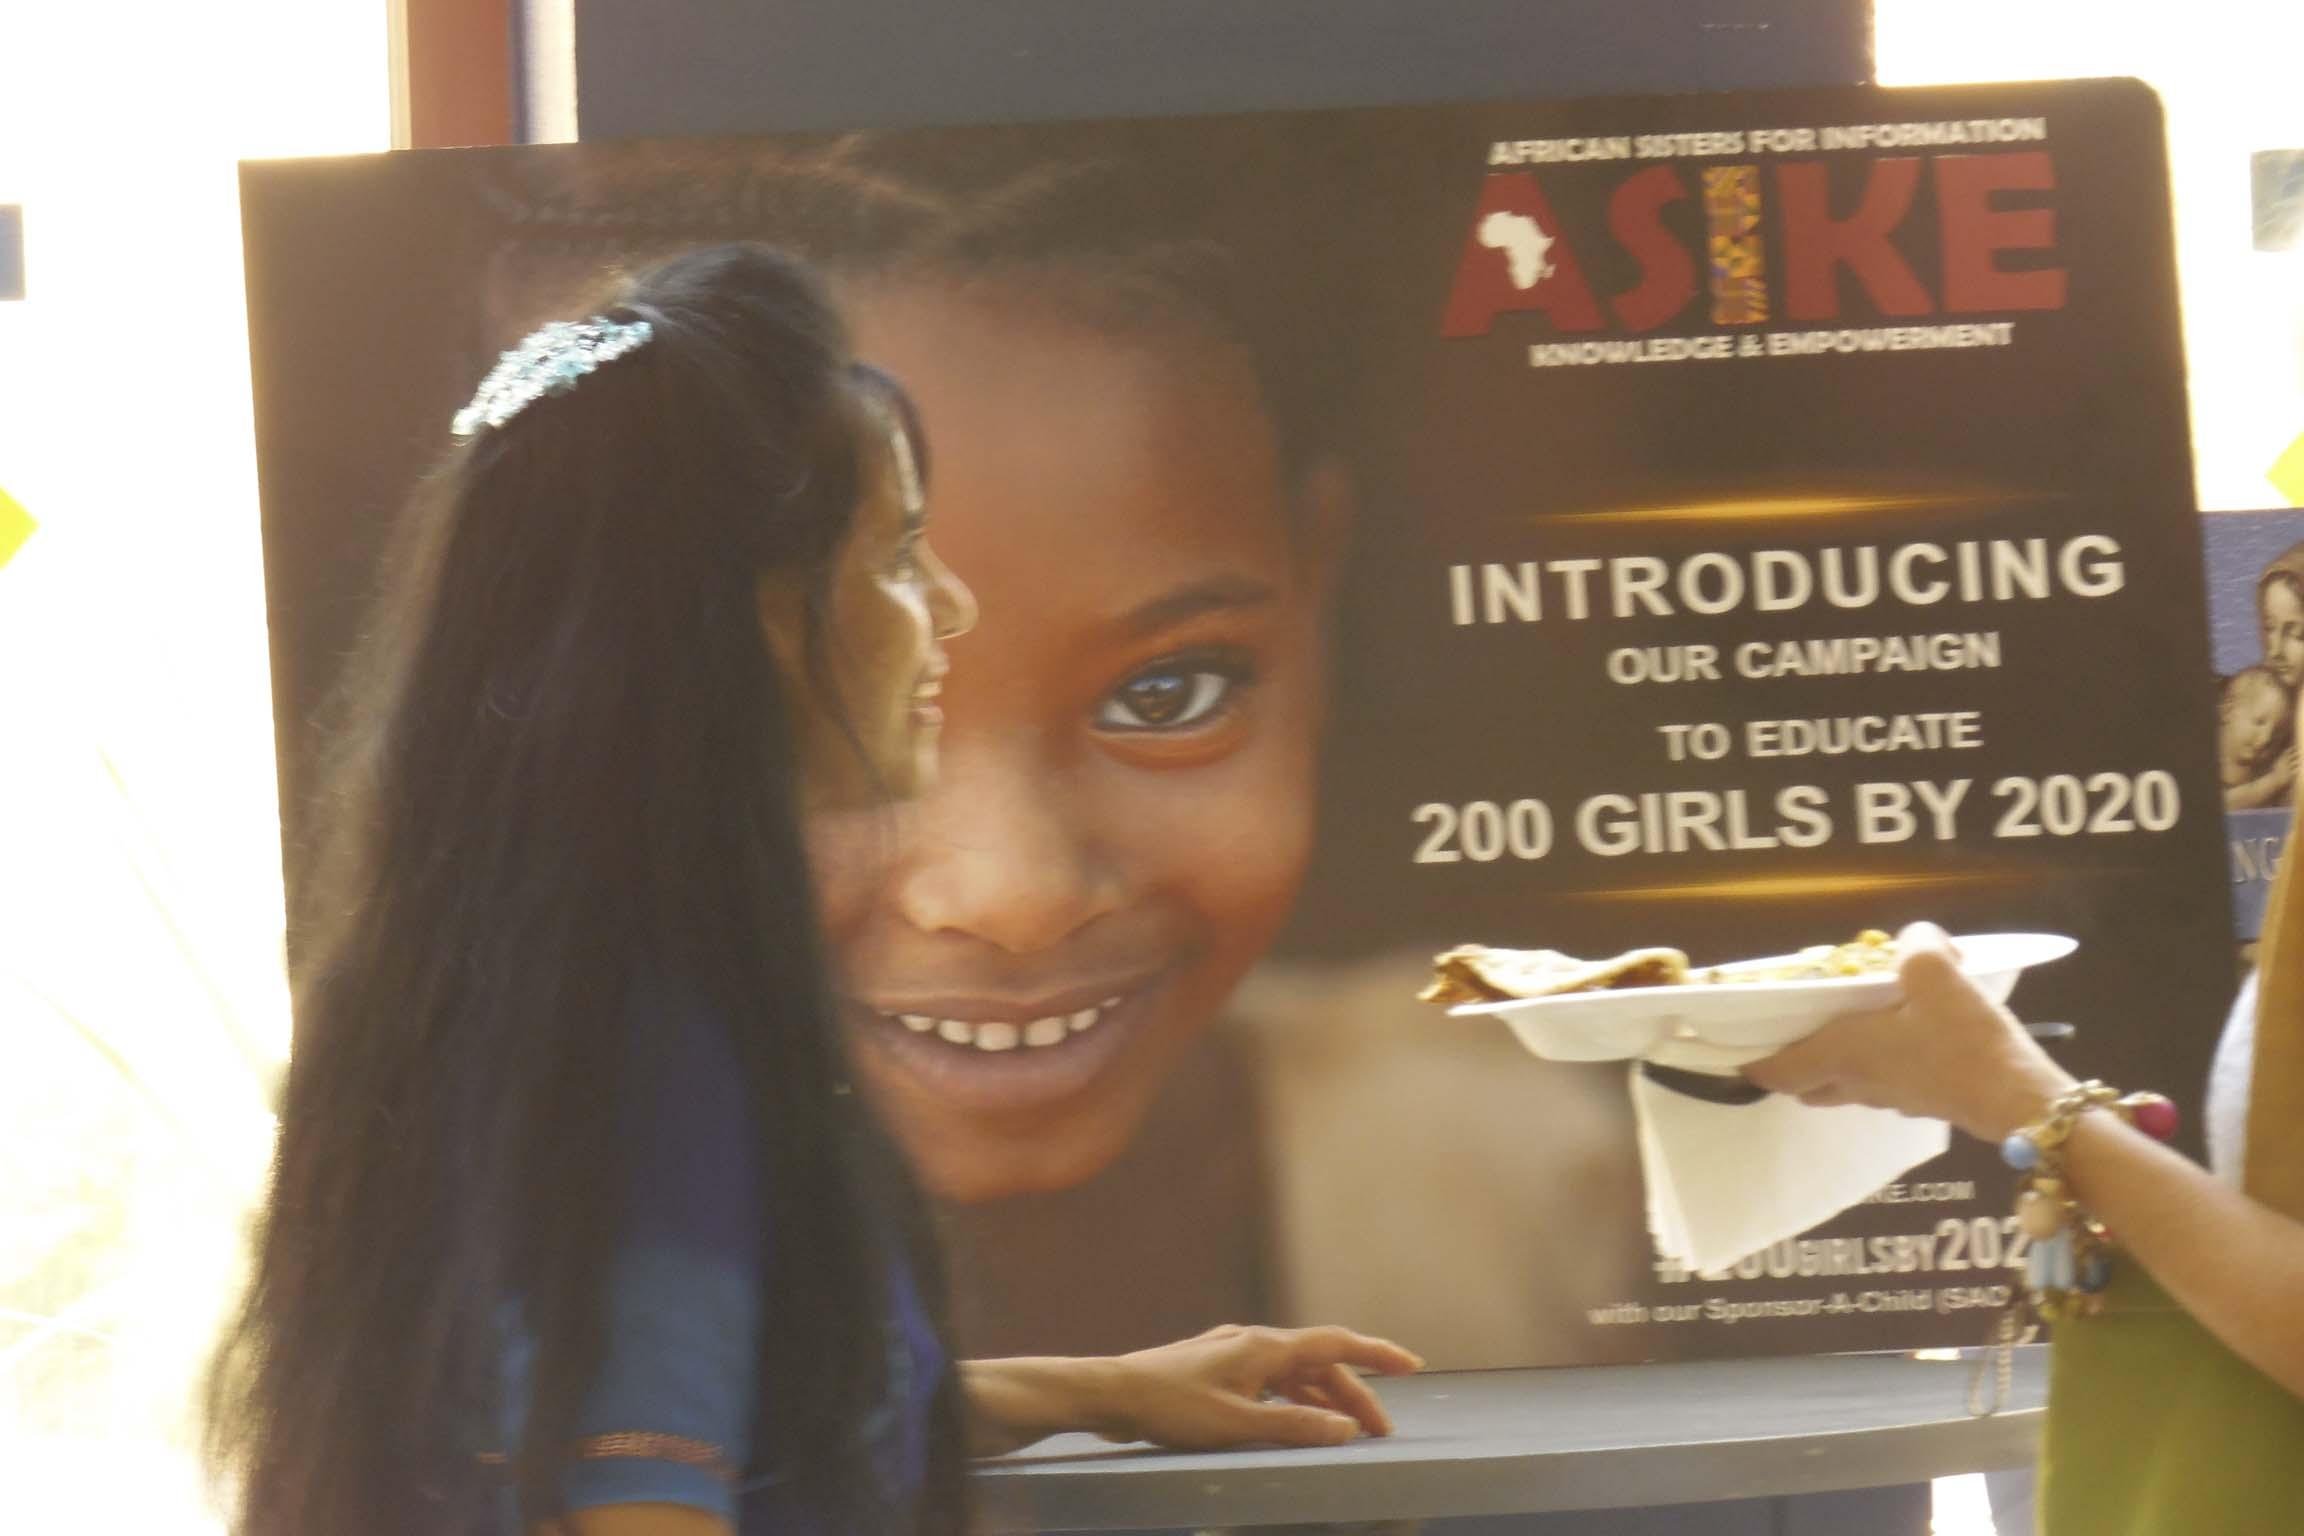 web Barankitse 2019Asike_African_Sisters_Information_Knowledge_Education_Fundraiser_2017_Goals_200Girls_2020web